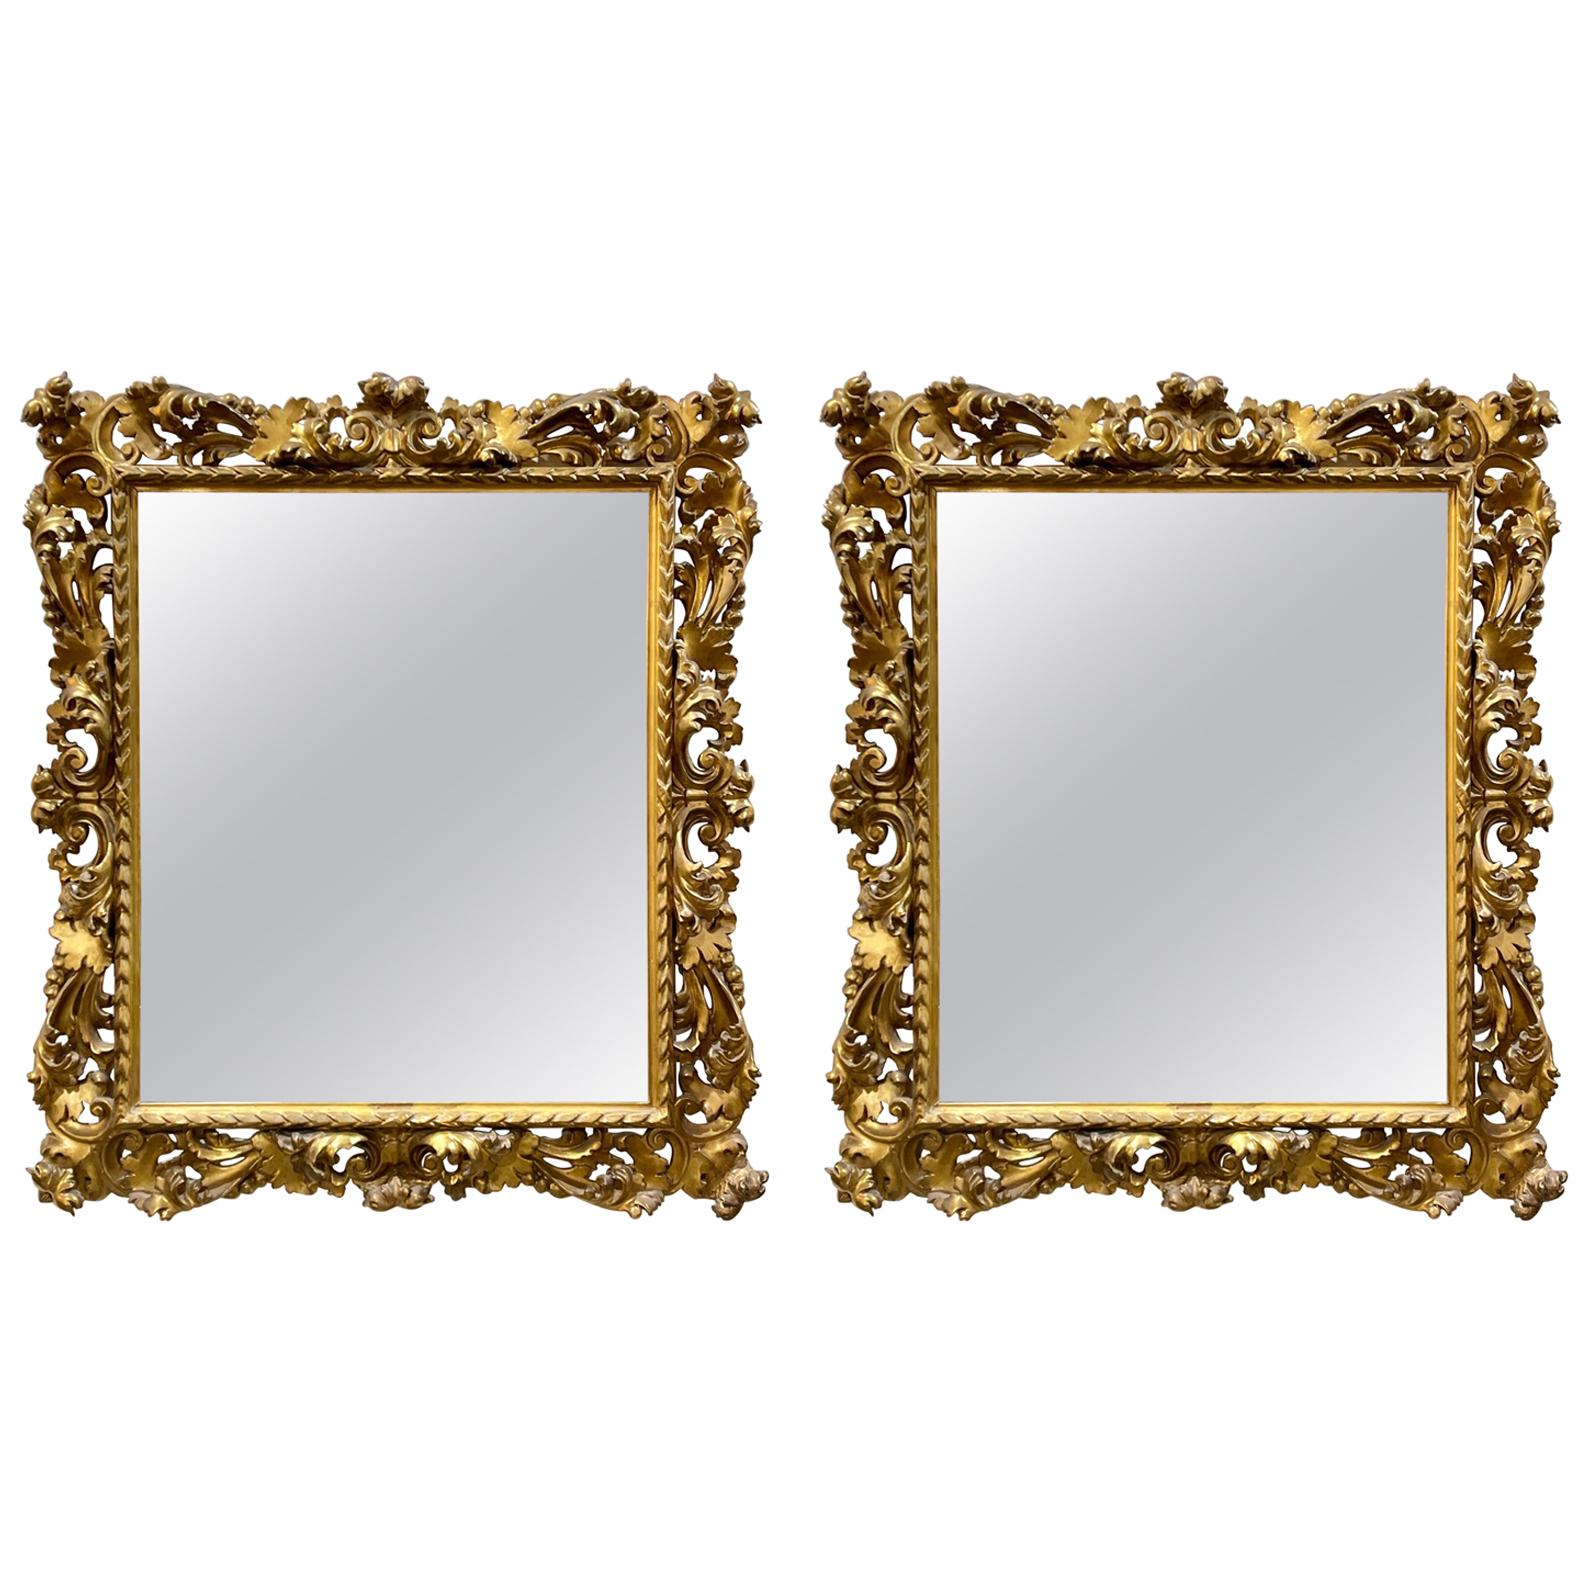 Pair of 19th Century Italian Gold Gilded Florentine Framed Mirrors